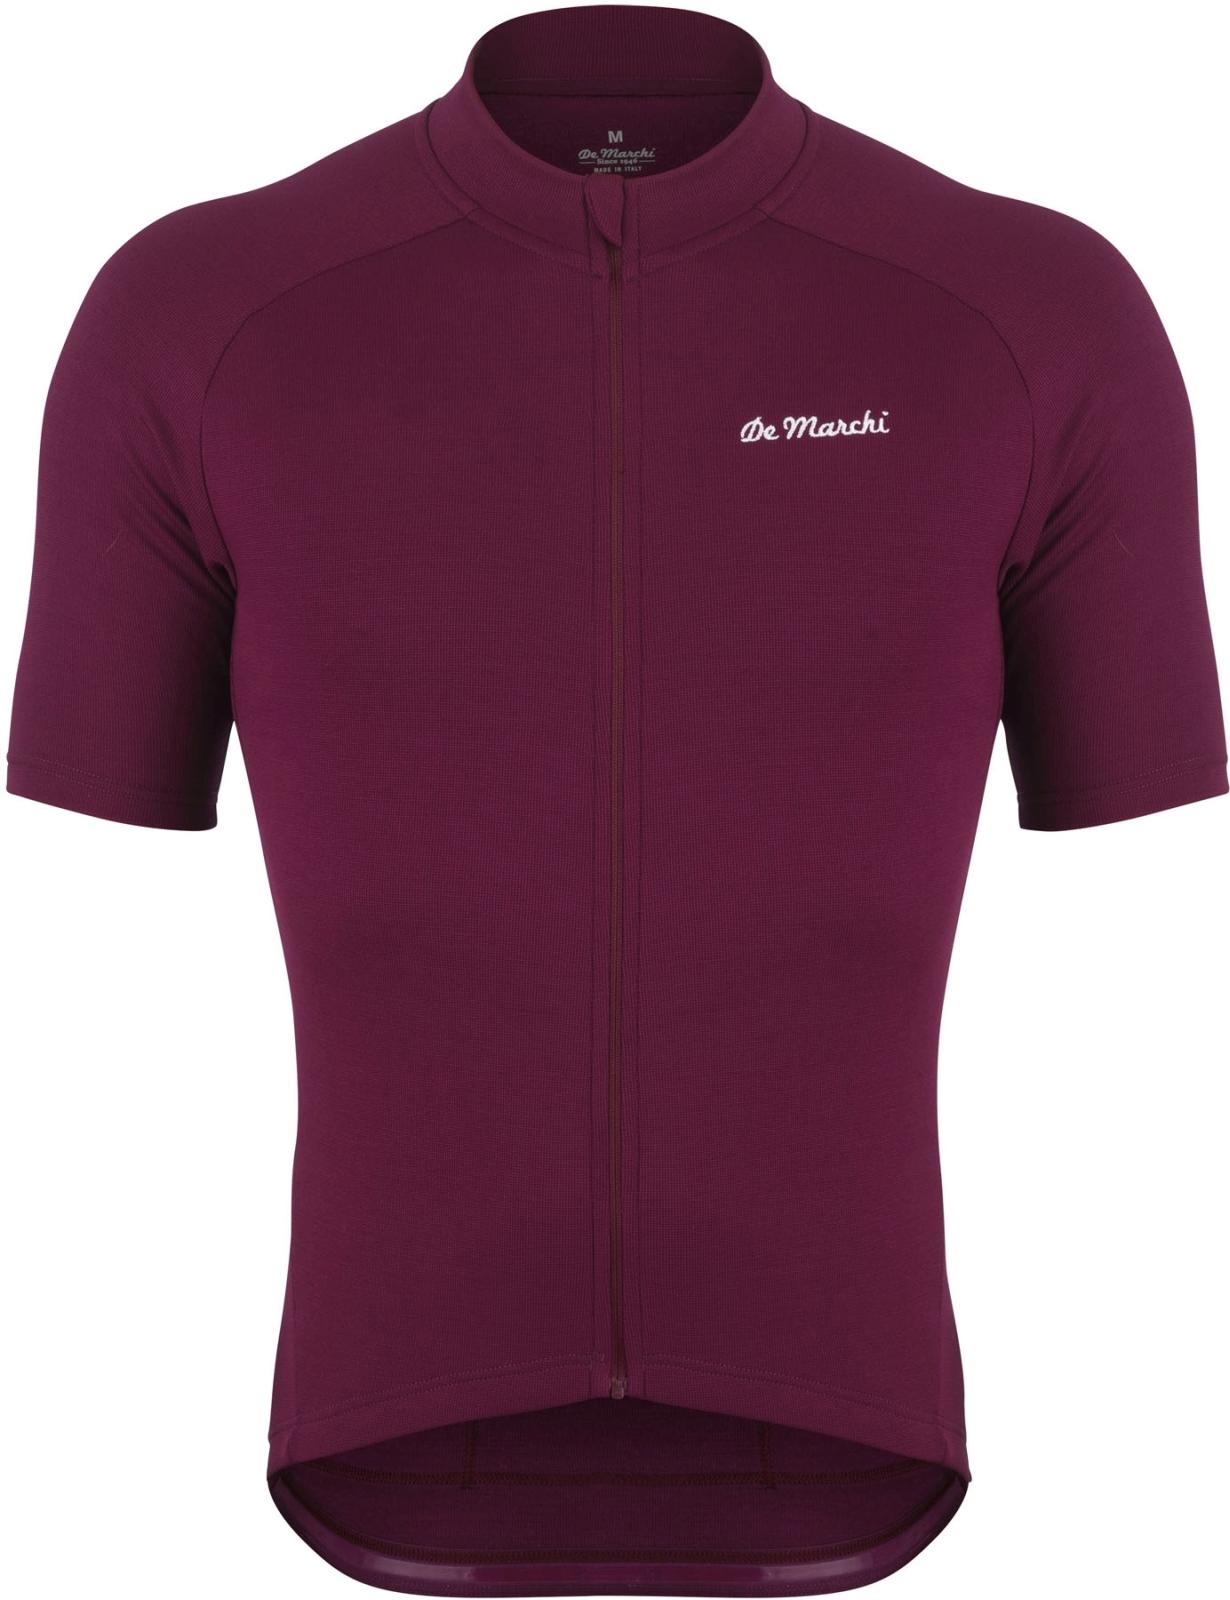 De Marchi Classica Jersey  - purple M